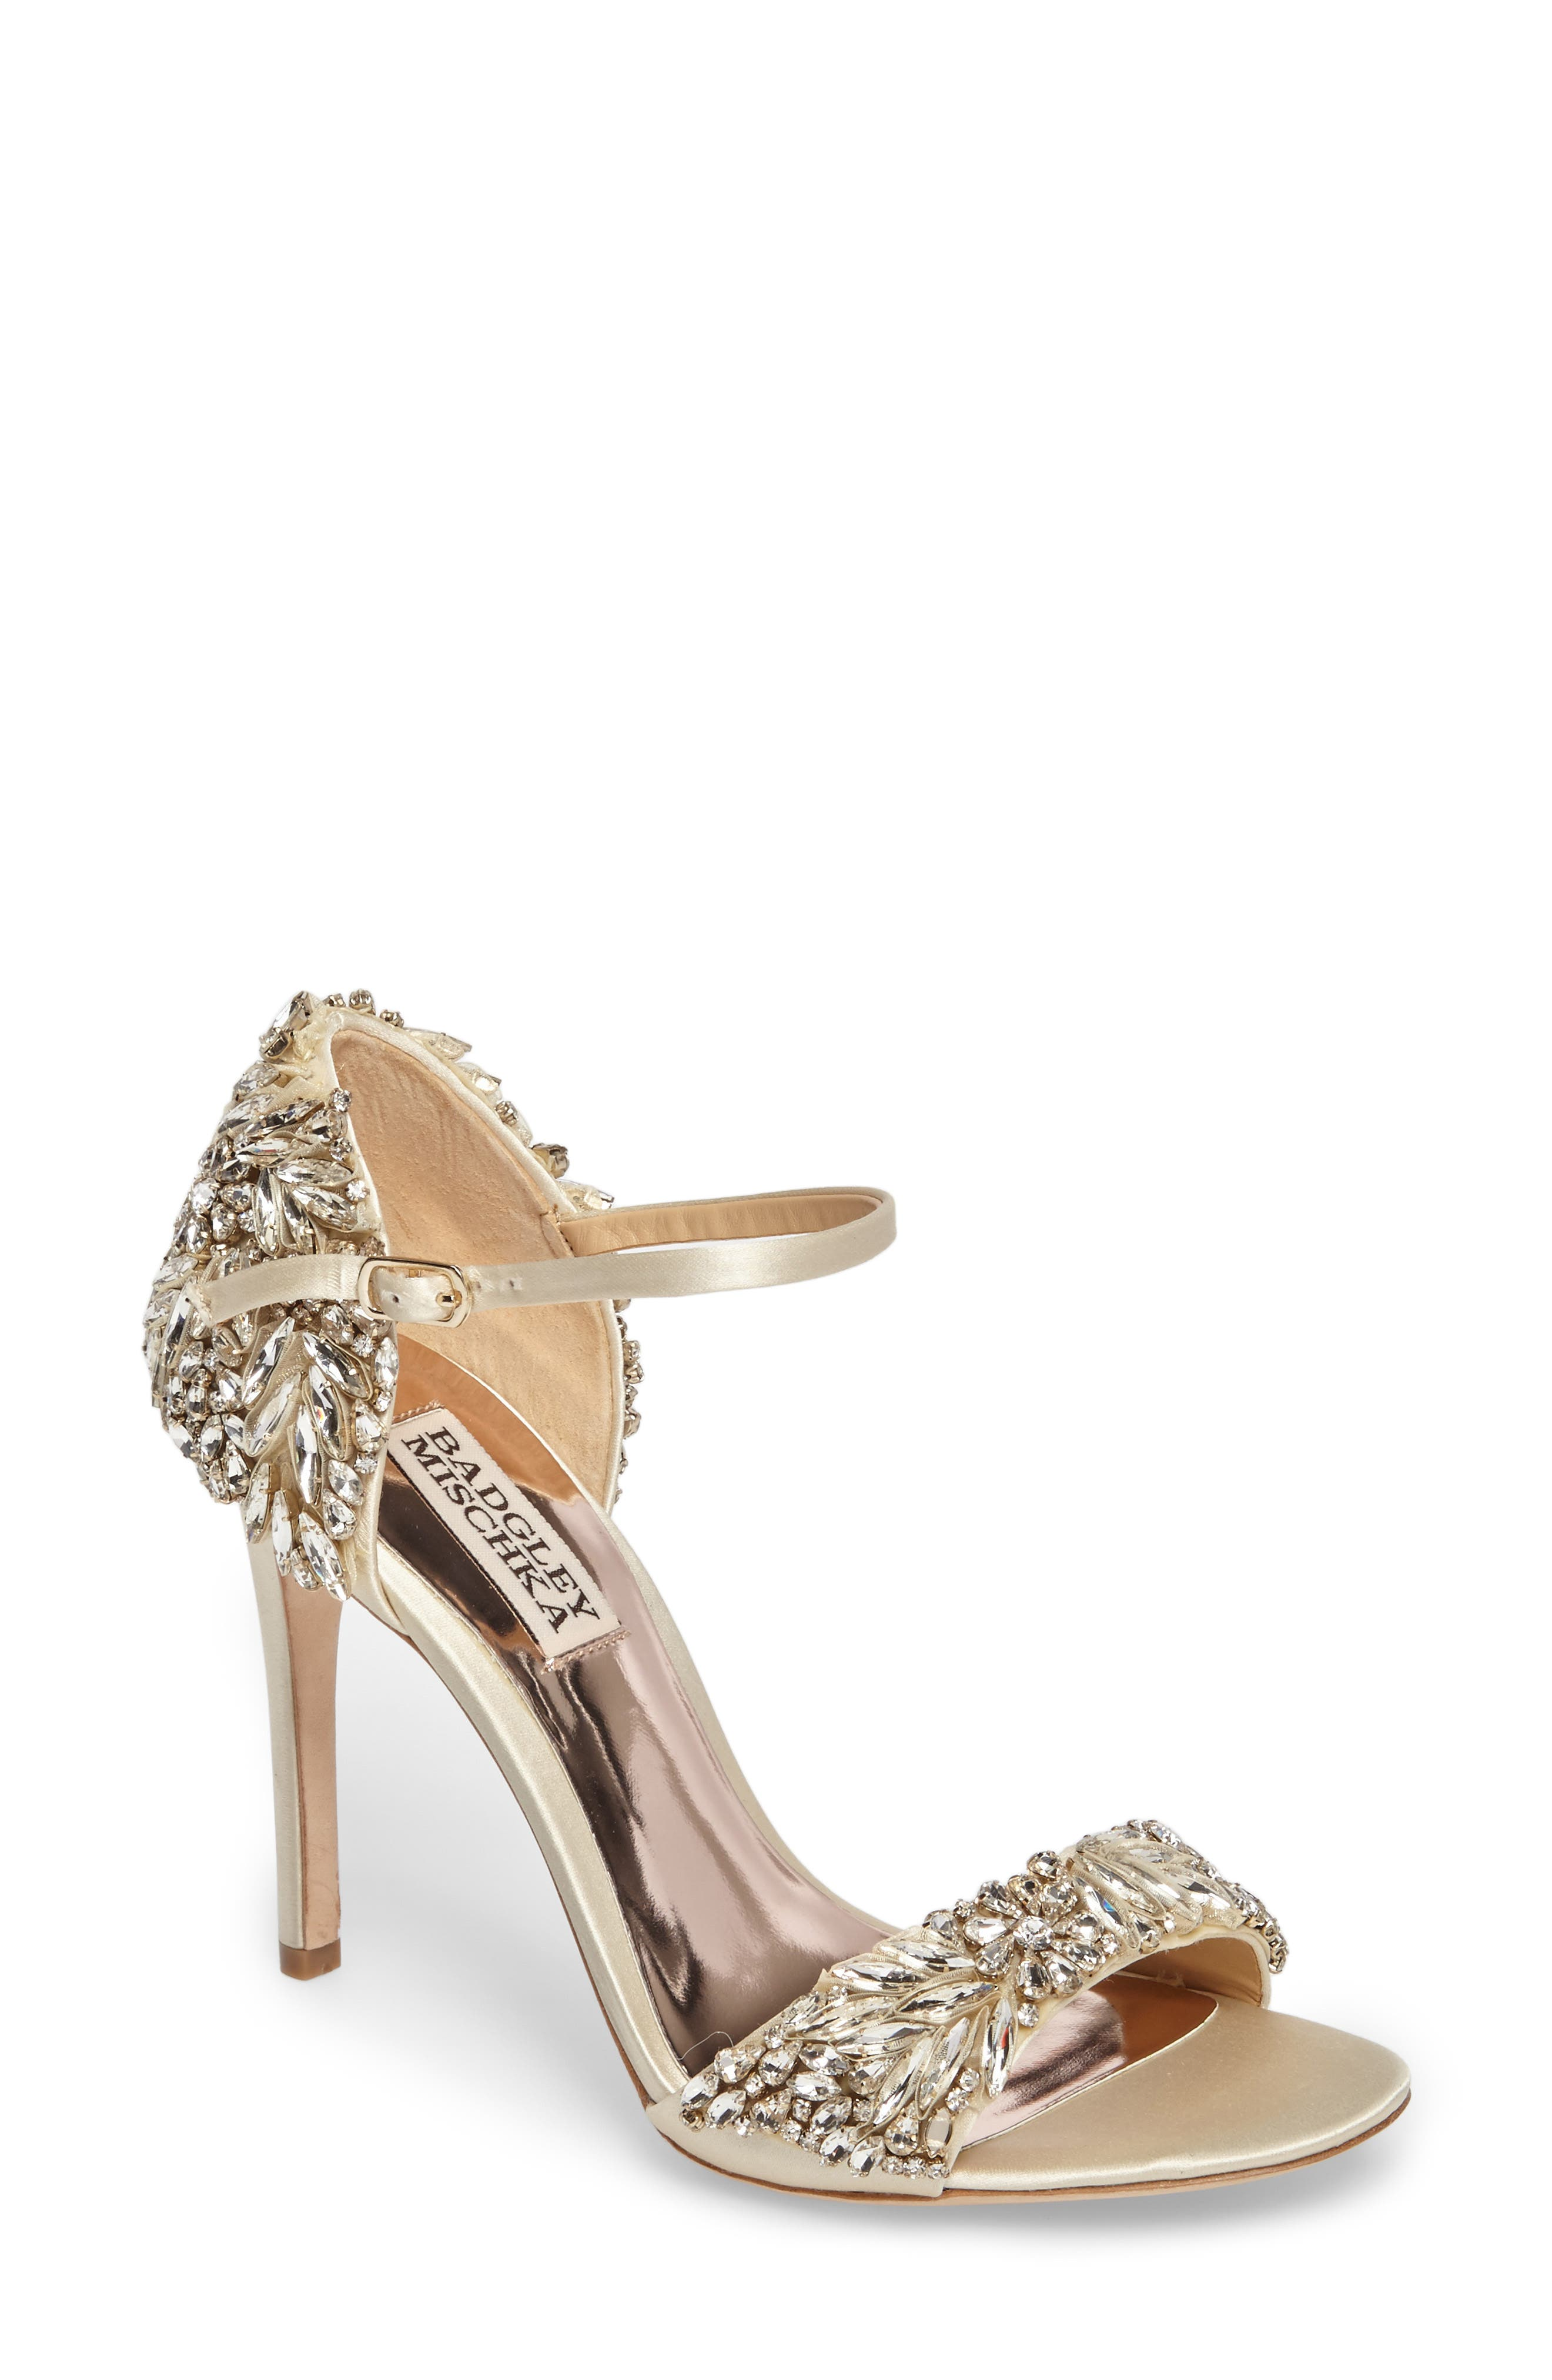 Main Image - Badgley Mischka Tampa Ankle Strap Sandal (Women)